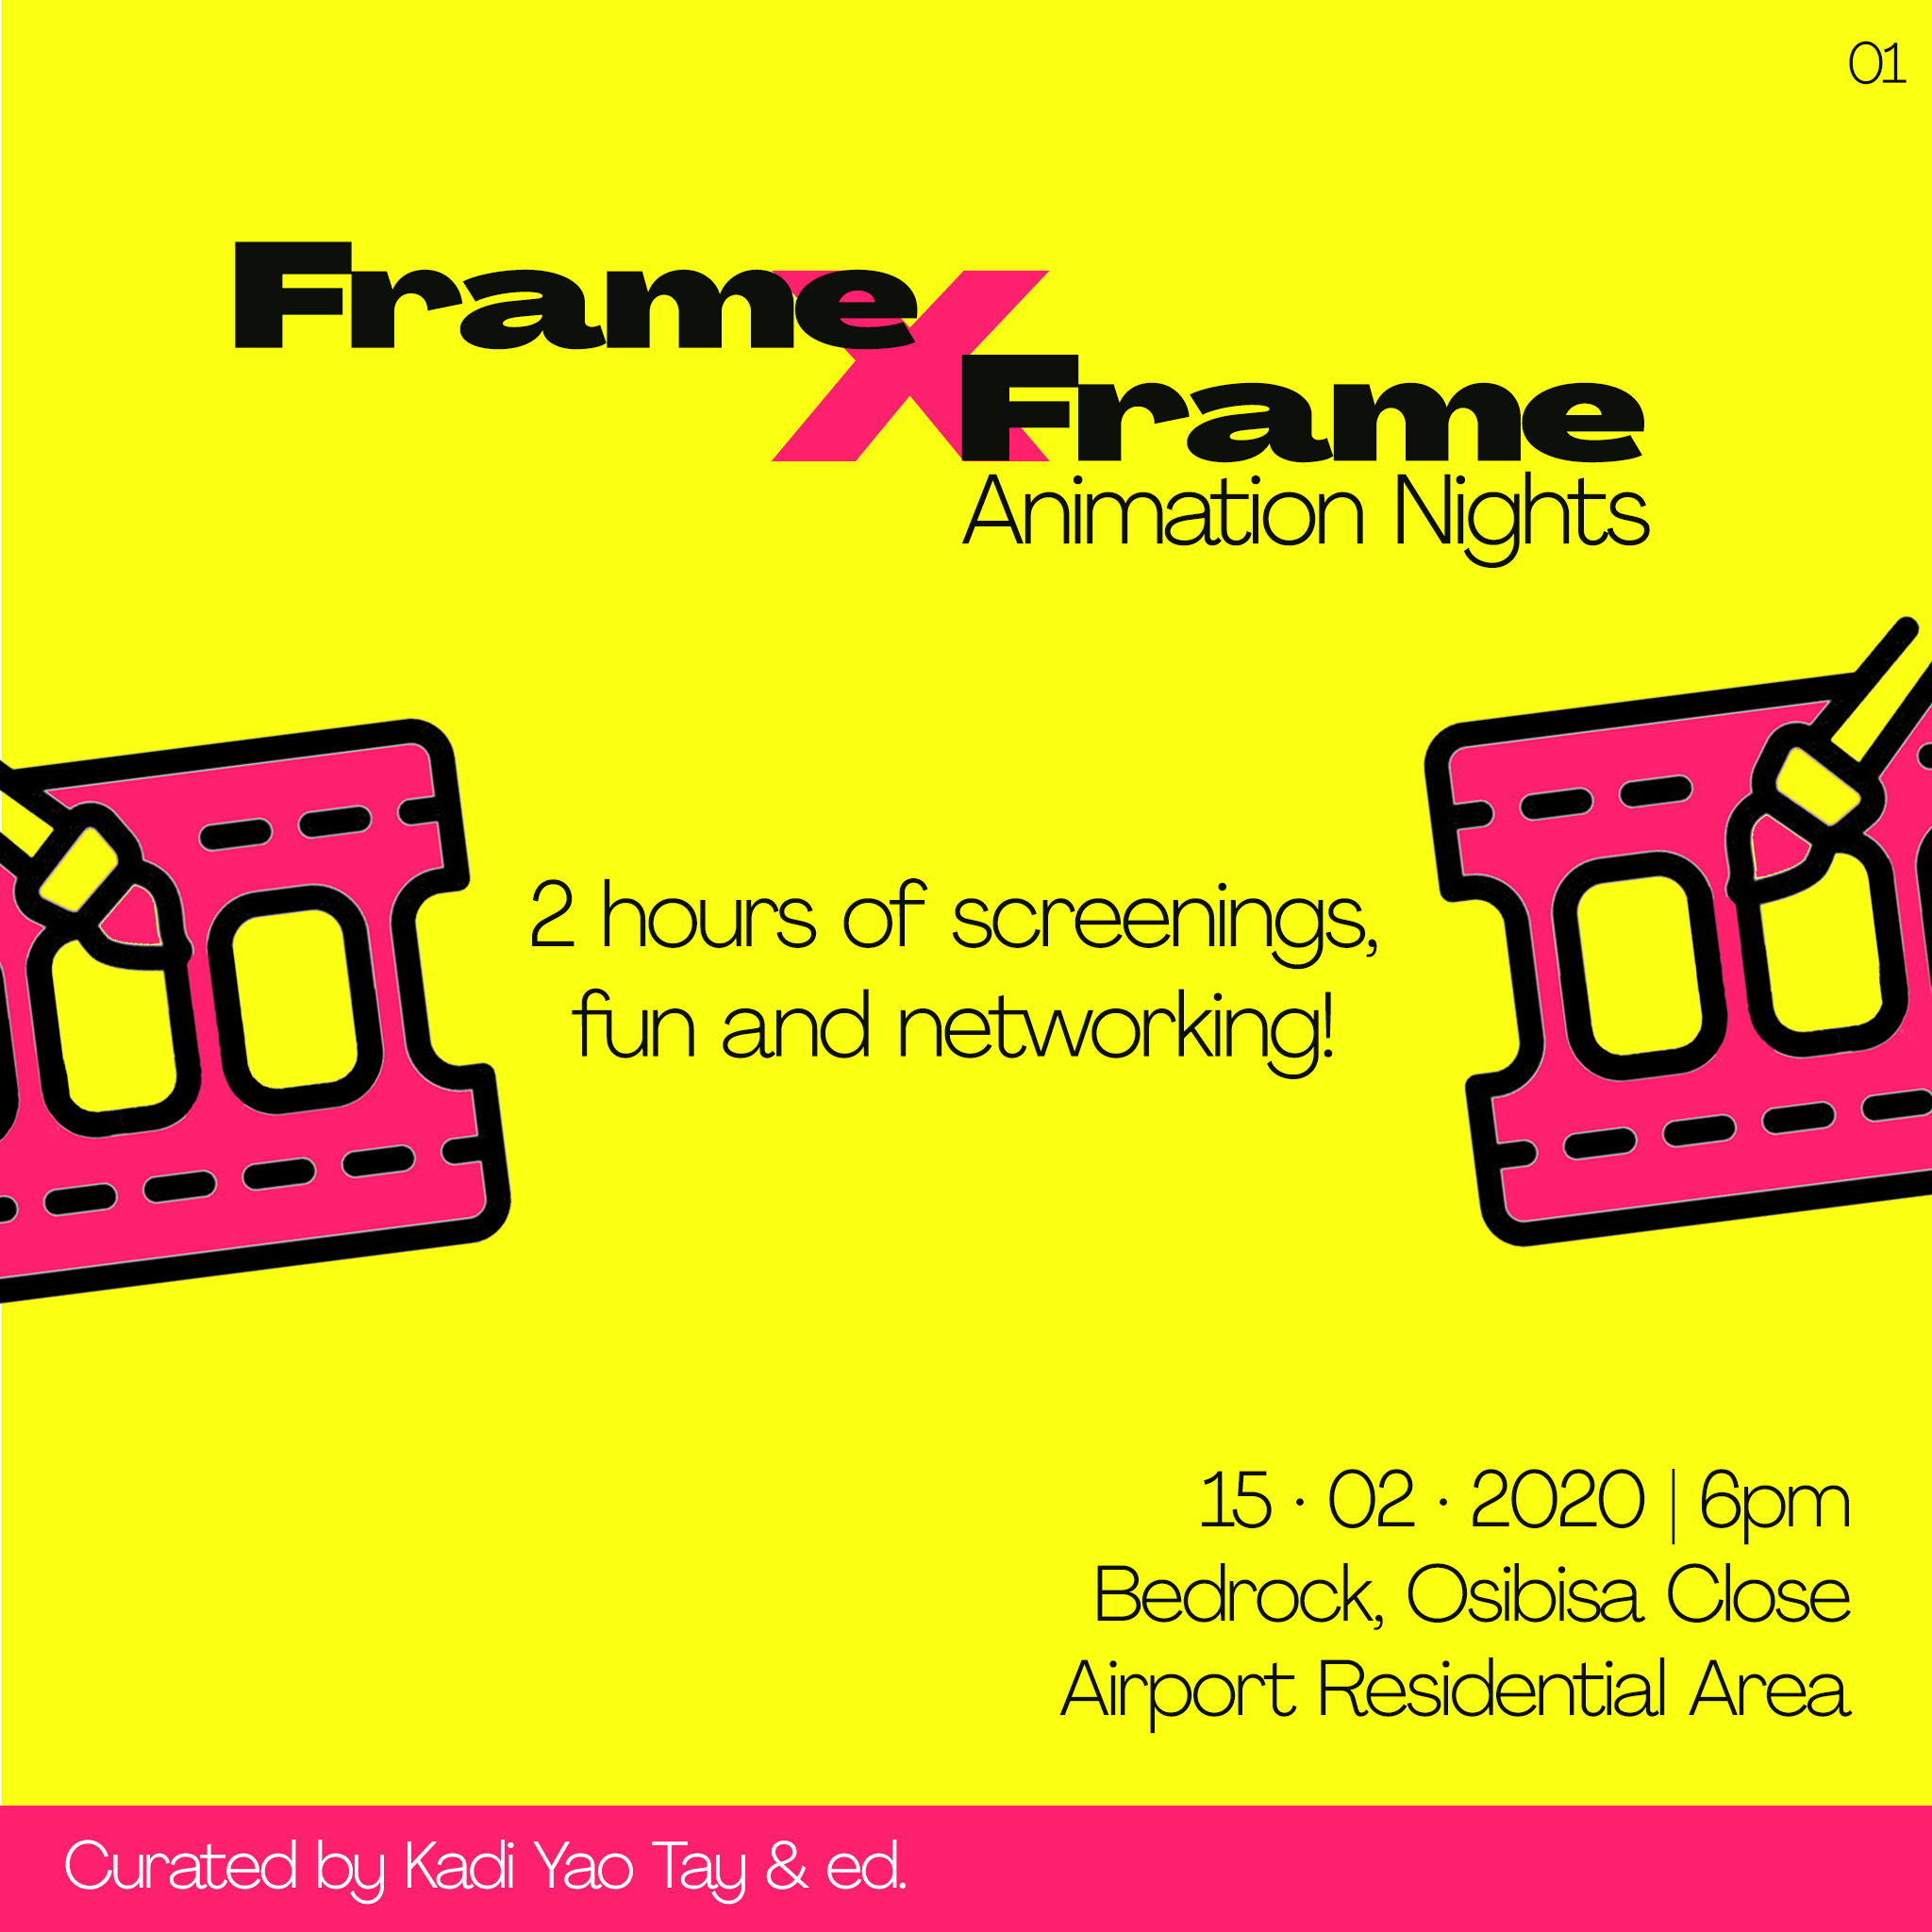 Frame x Frame Animation Nights